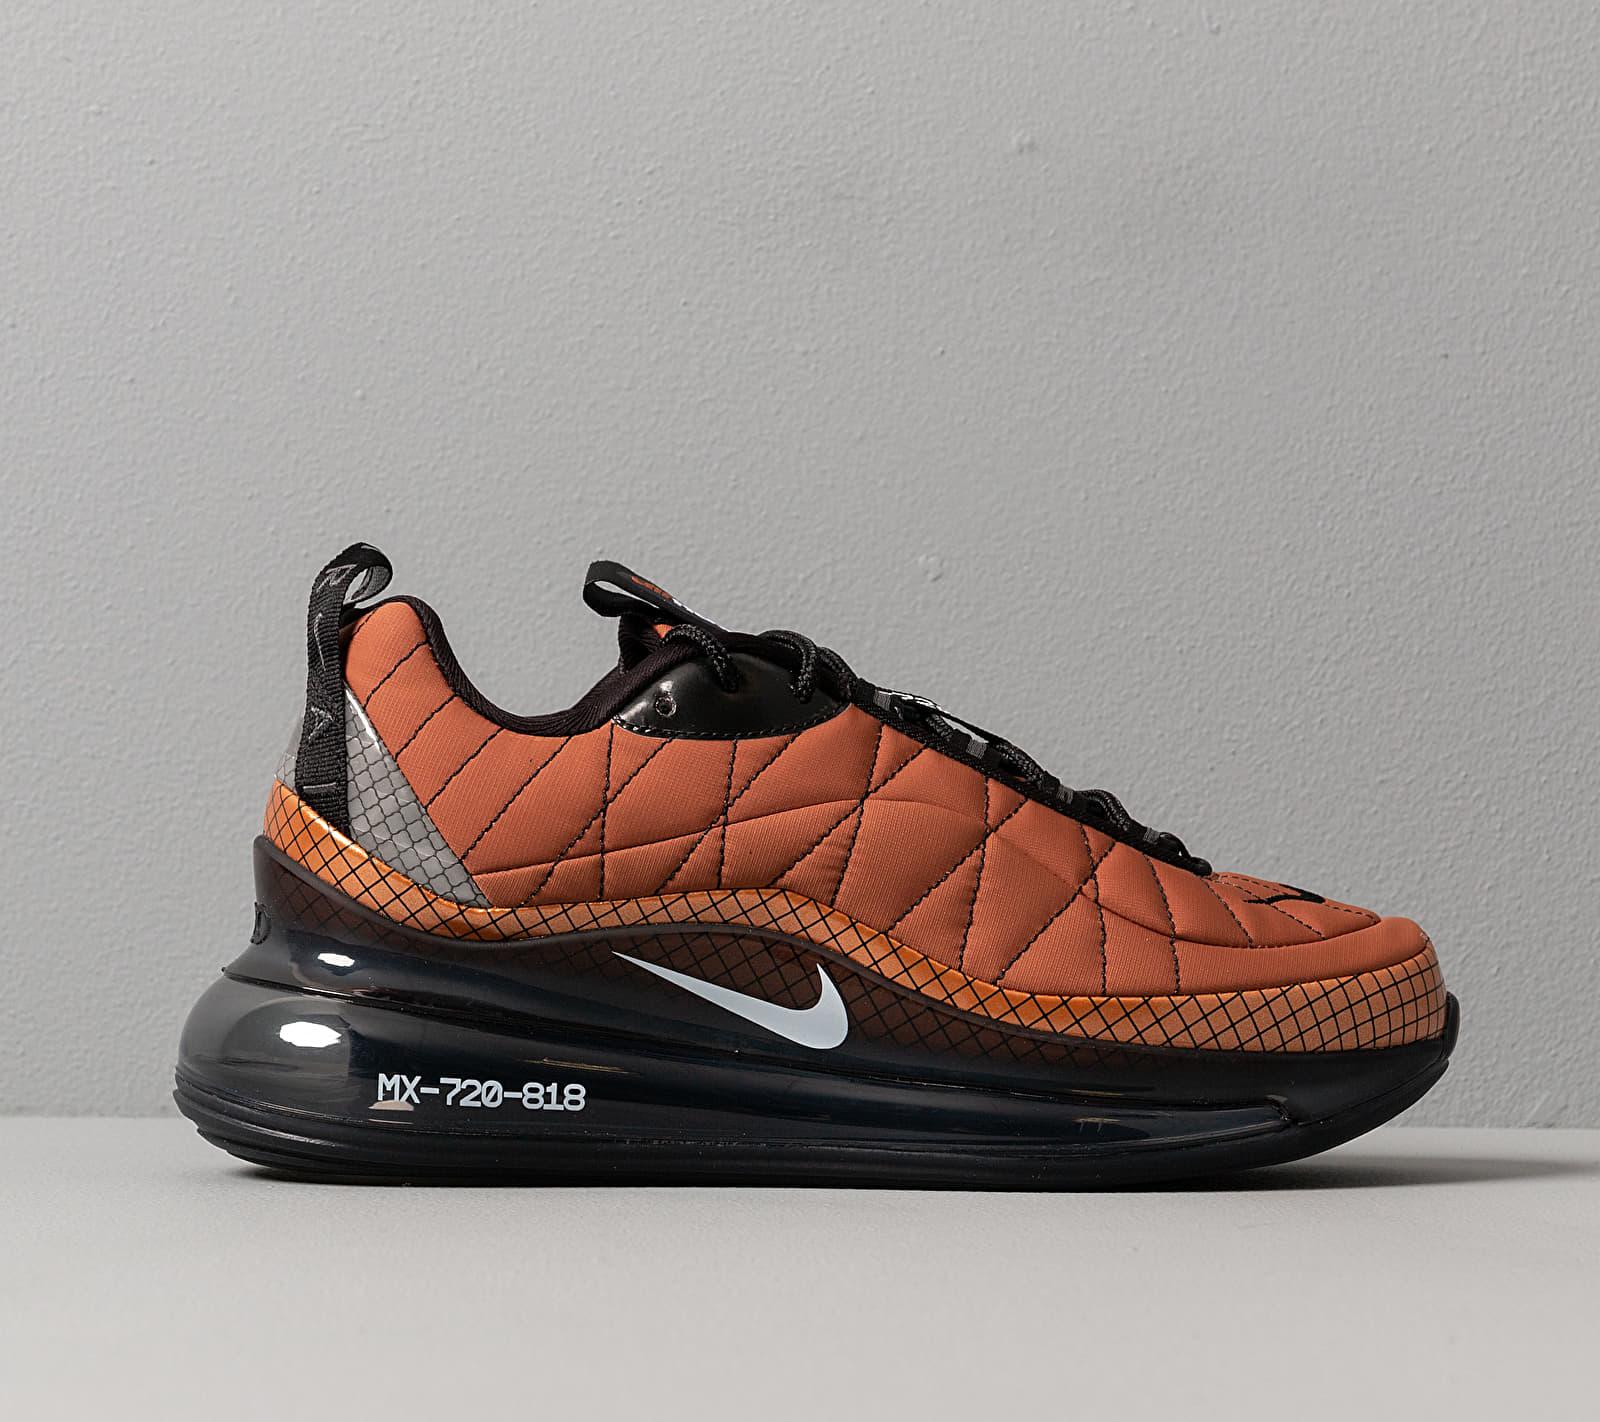 Nike W Mx 720 818 Metallic Copper White Black Anthracite Brown